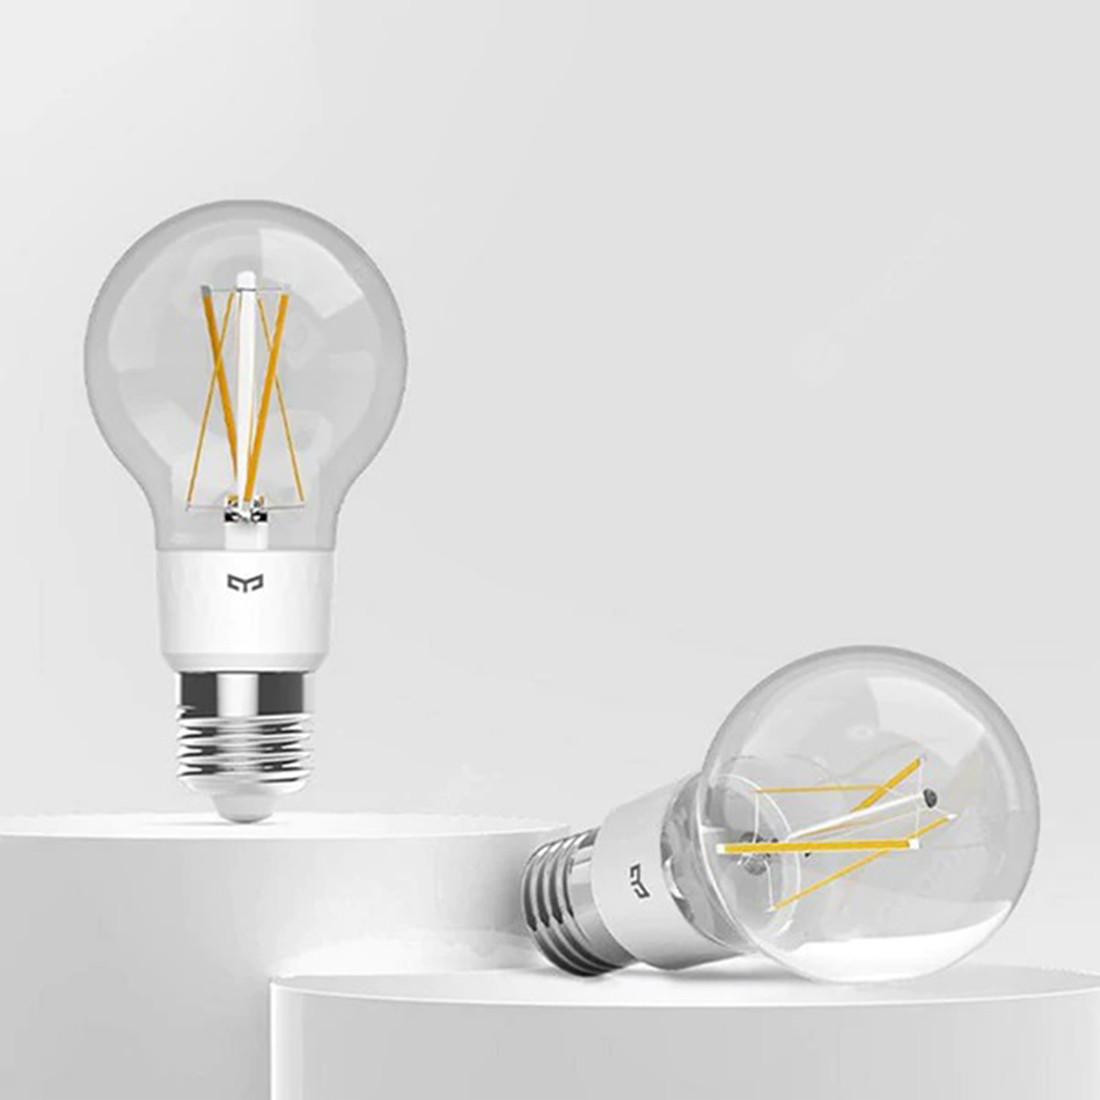 Лампочка Yeelight LED Filament Light